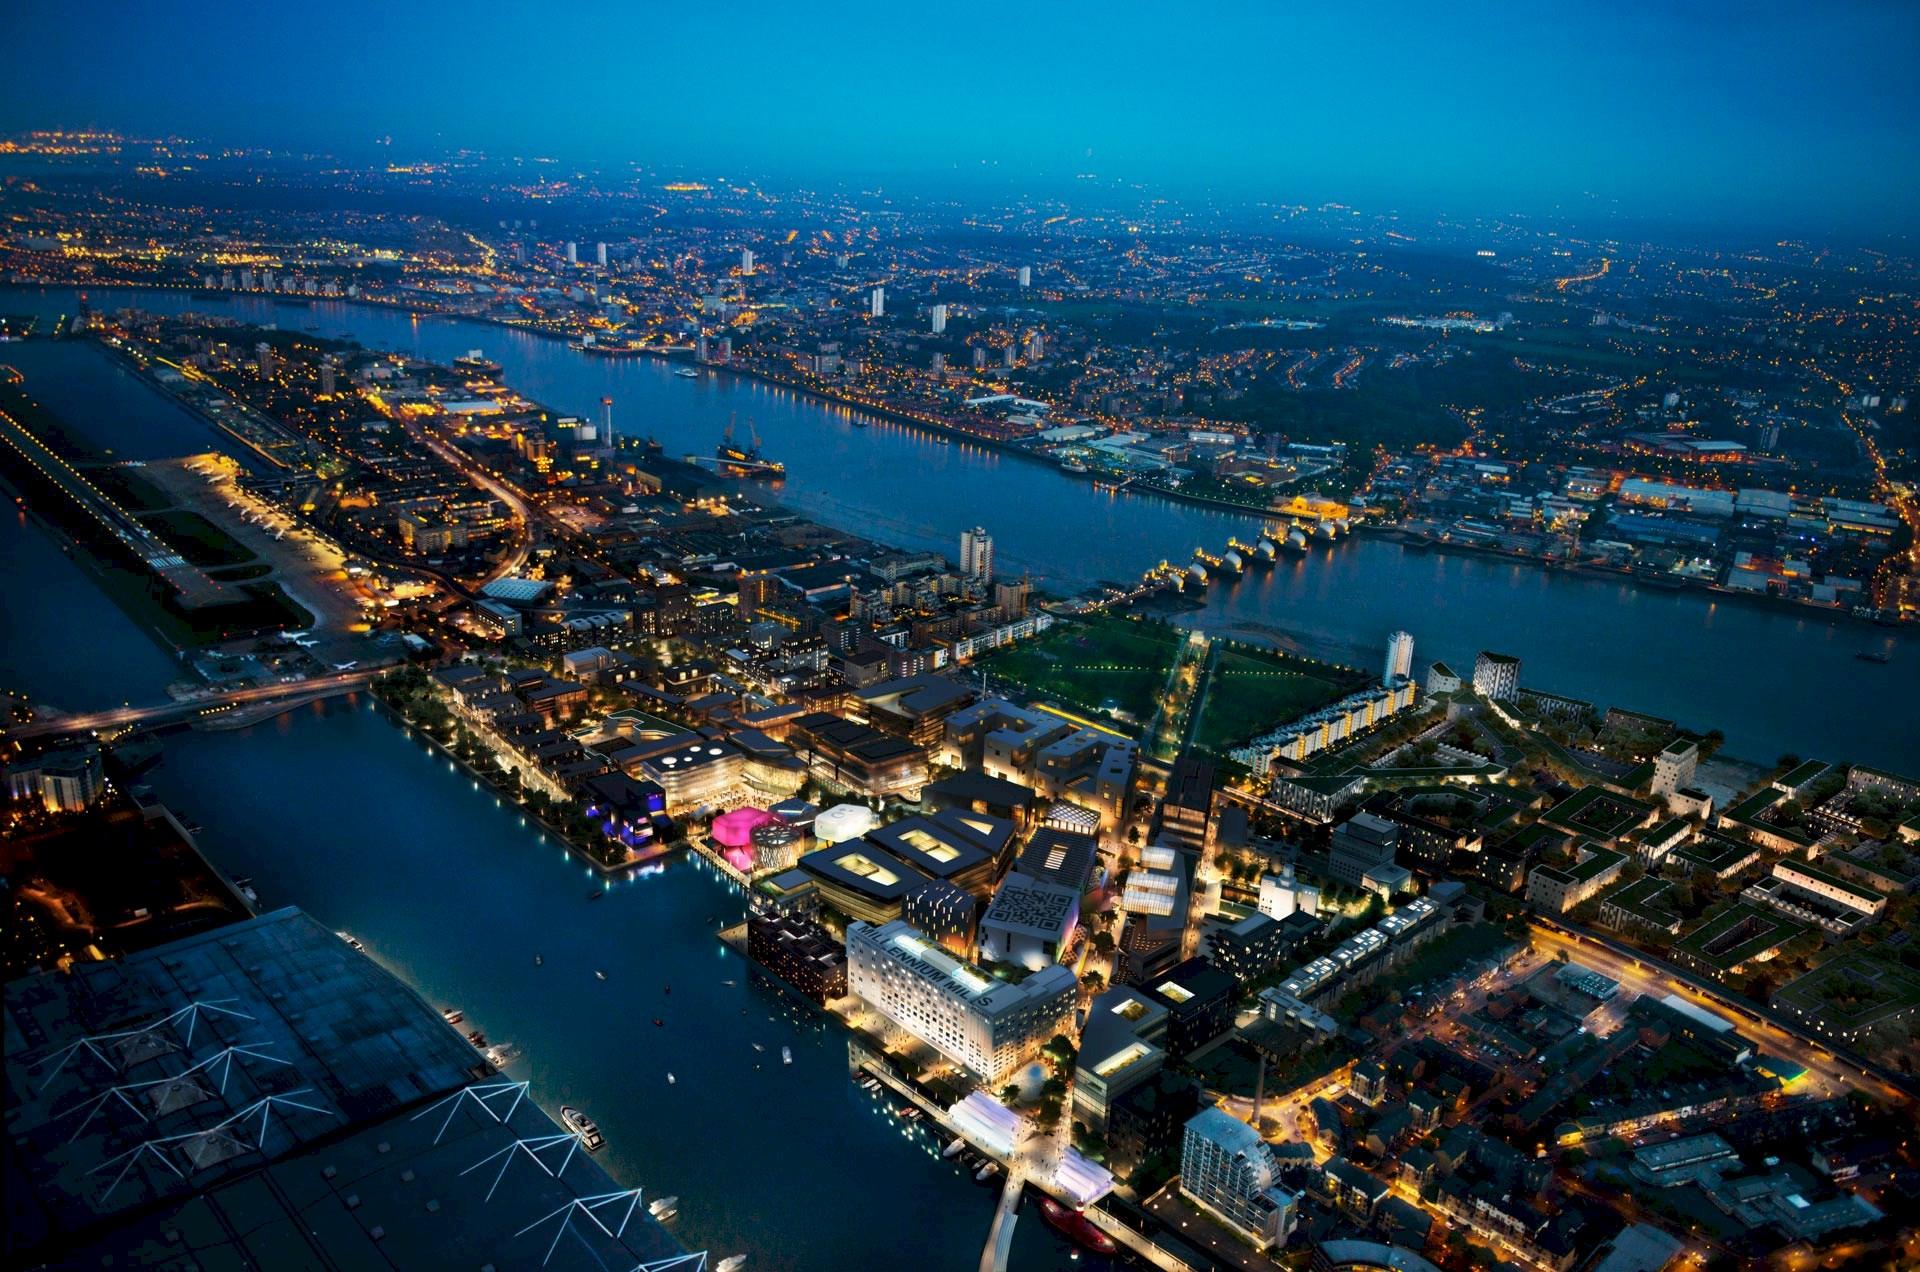 Benoy Announces Work on East London Icon - Silvertown